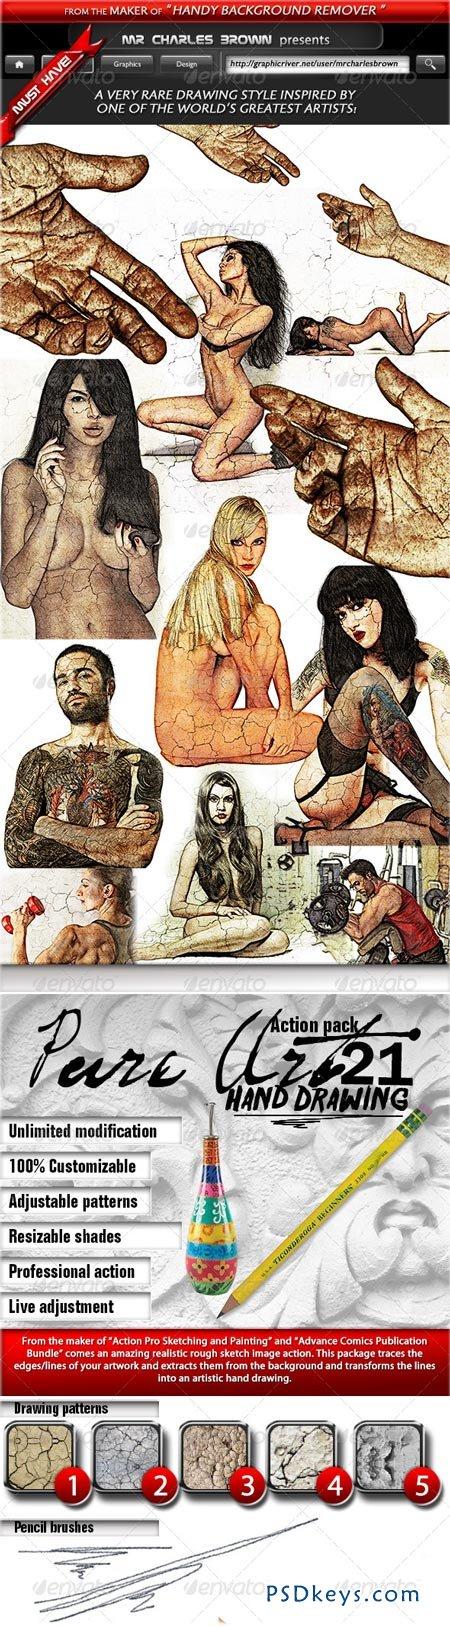 Pure Art Hand Drawing 21 – Good MicAng Art Replica 5117758